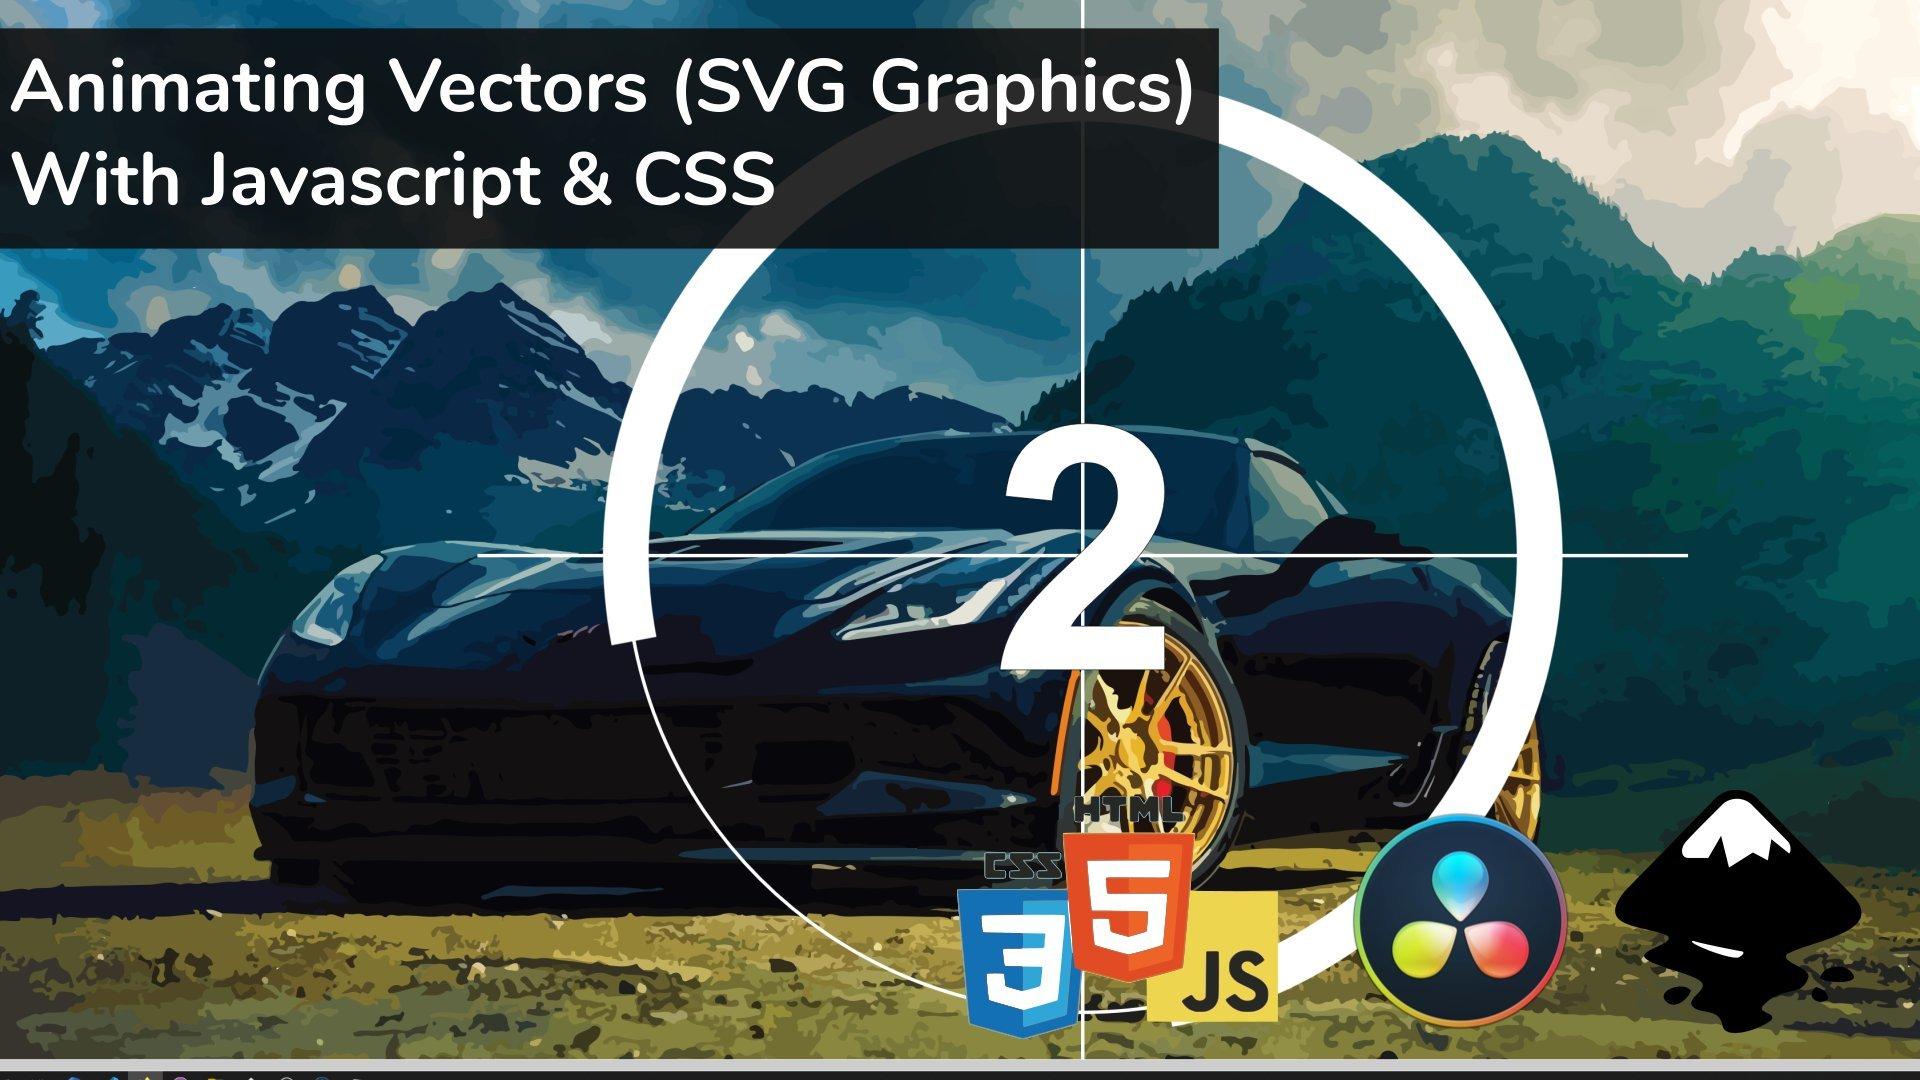 Animating Vector (SVG Graphics) Using Javascript & CSS